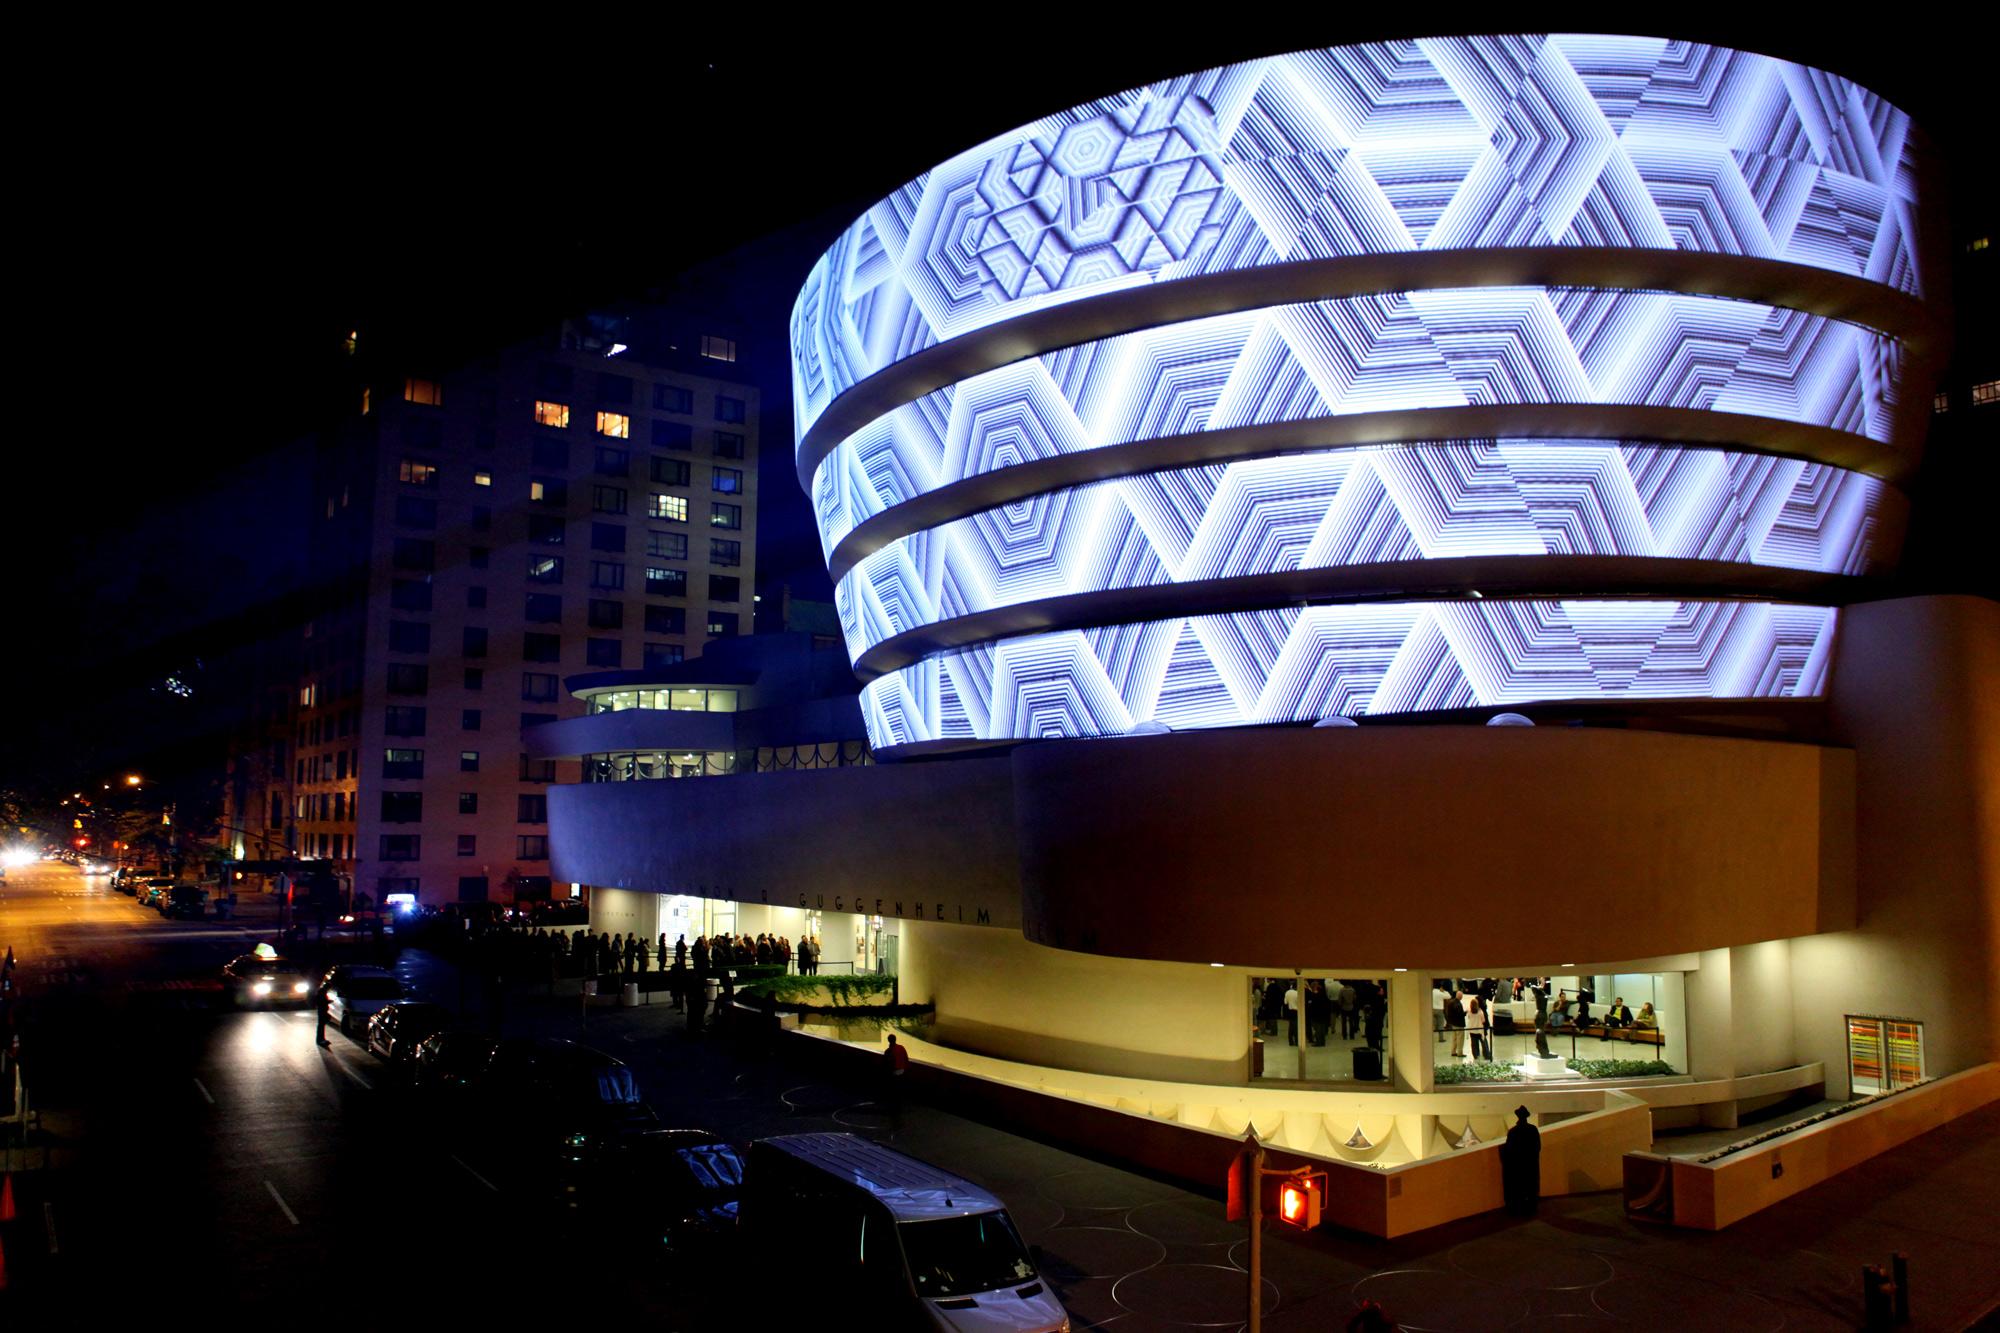 Threlkel's projections on the Guggenheim Museum. Photo: Joshua Brott